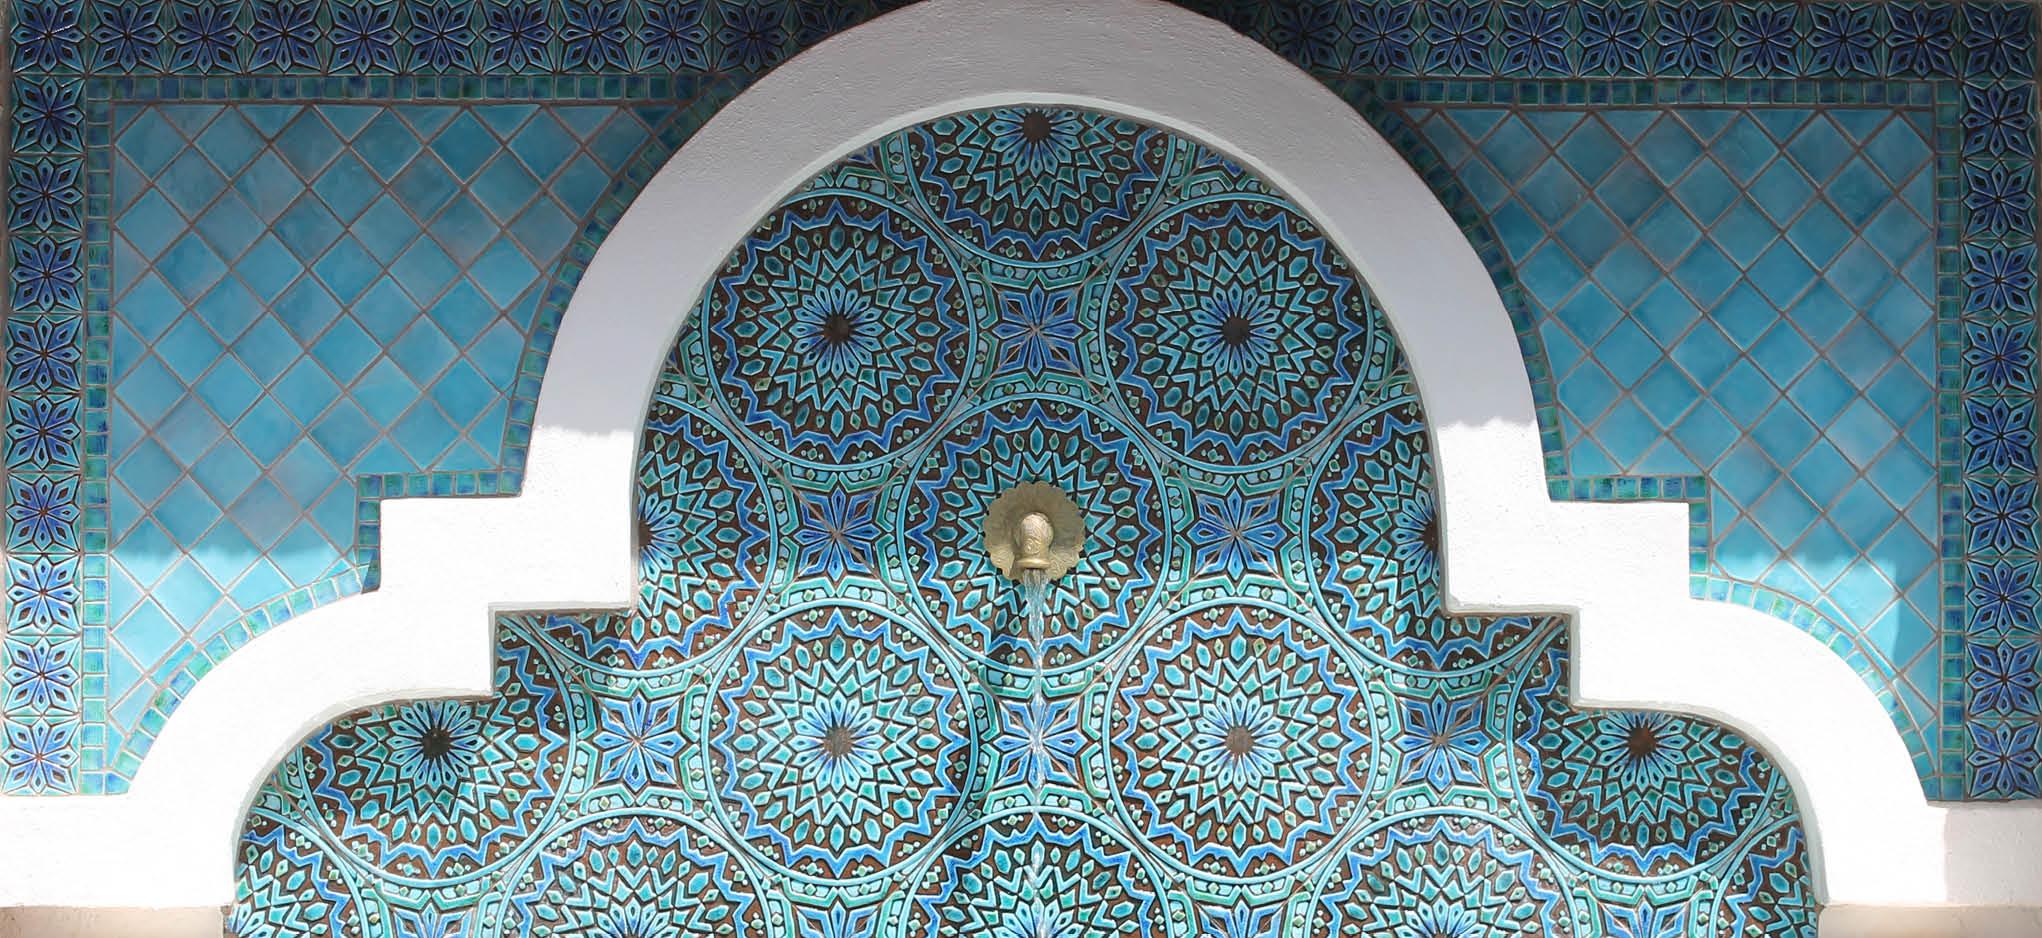 Moroccan fountain image